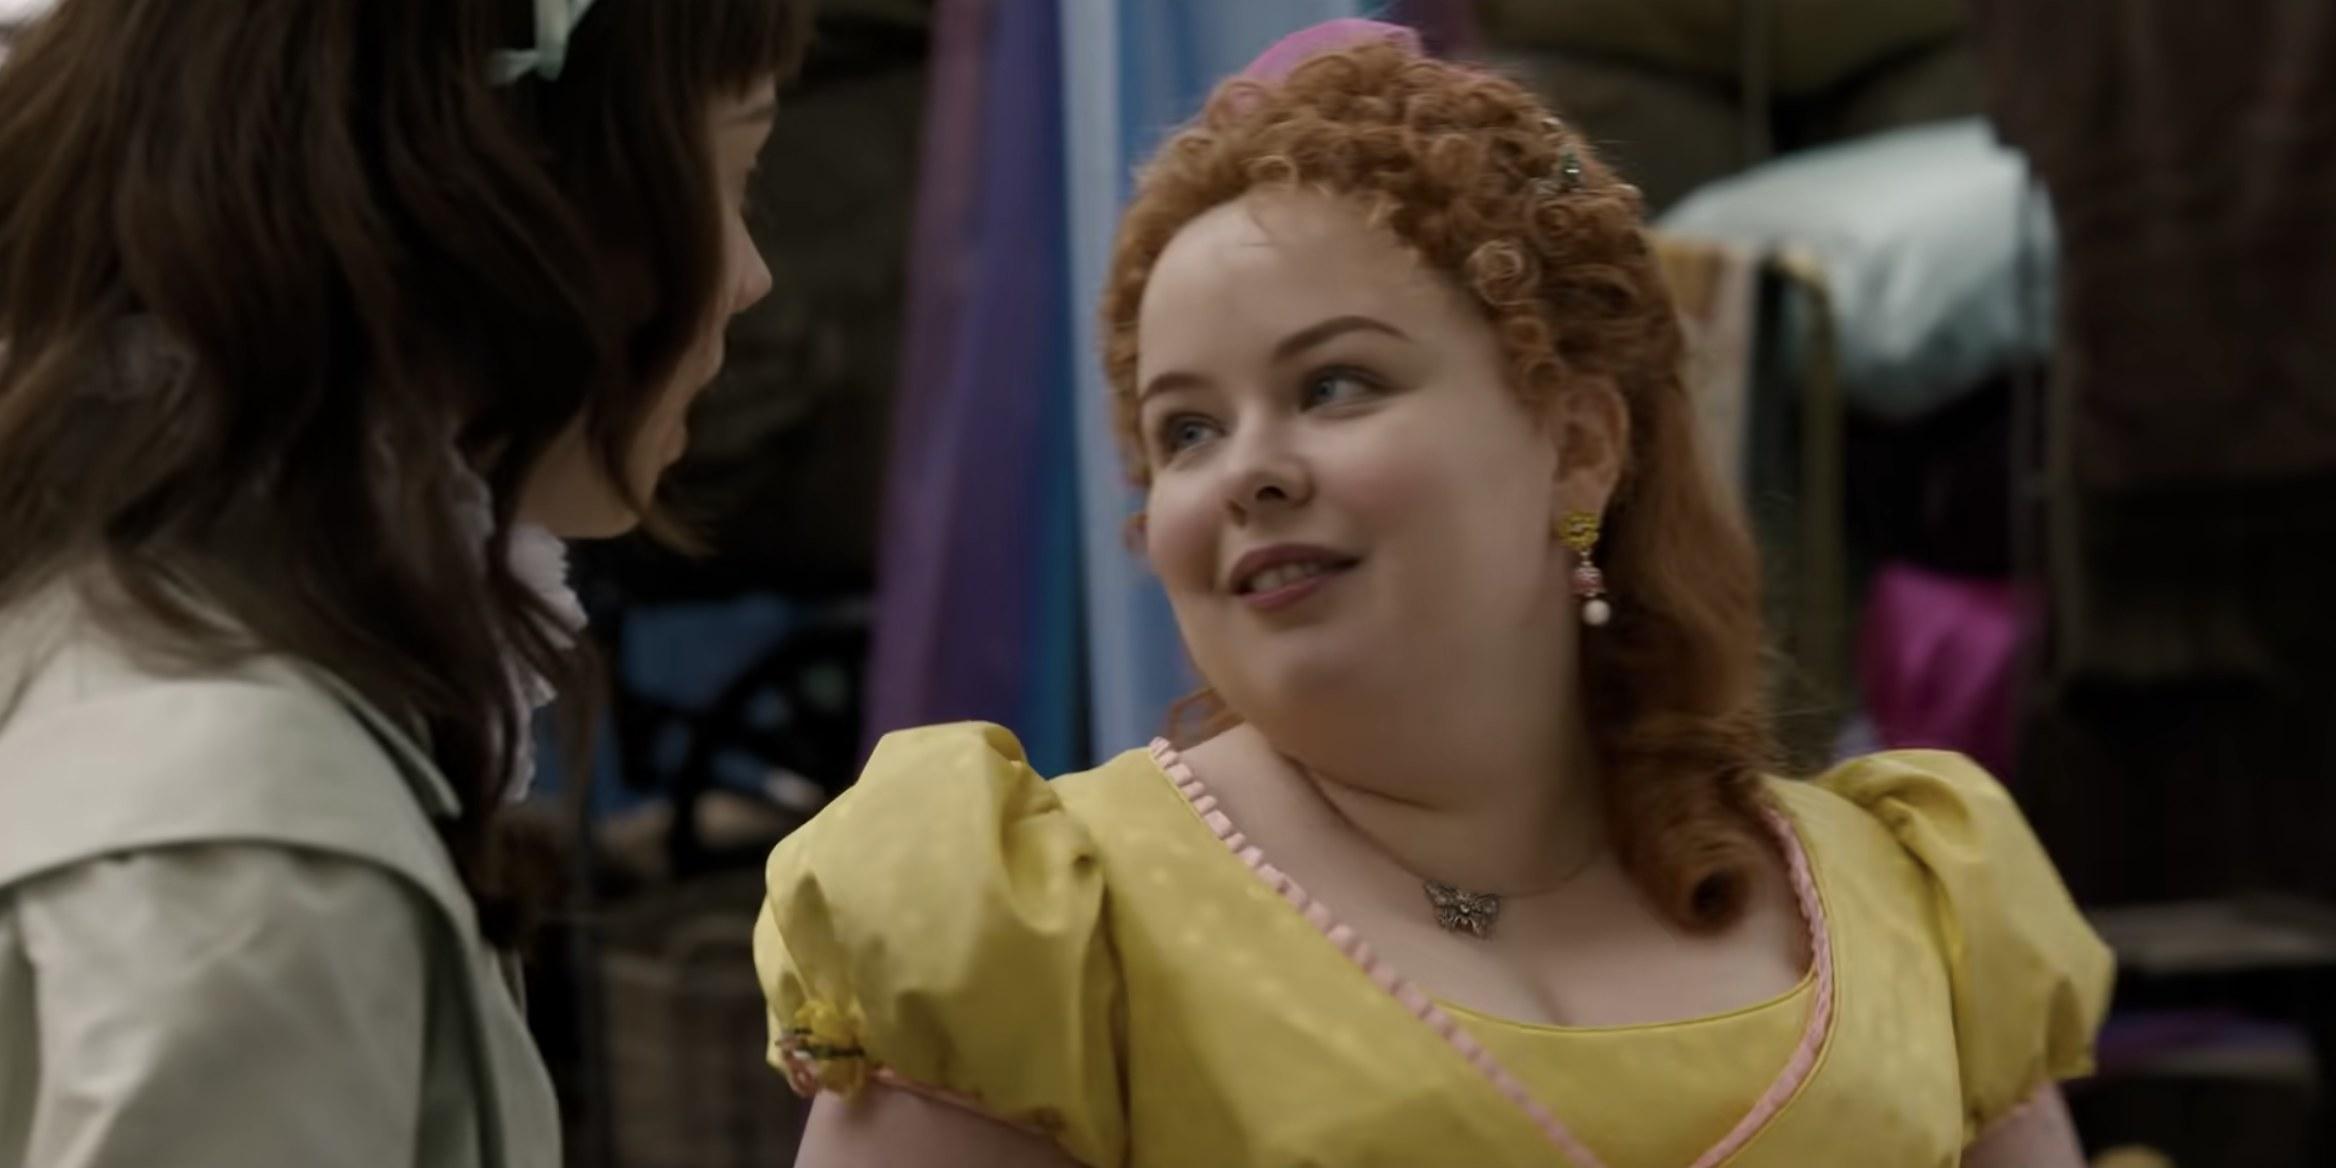 Penelope talking to Eloise in Bridgerton